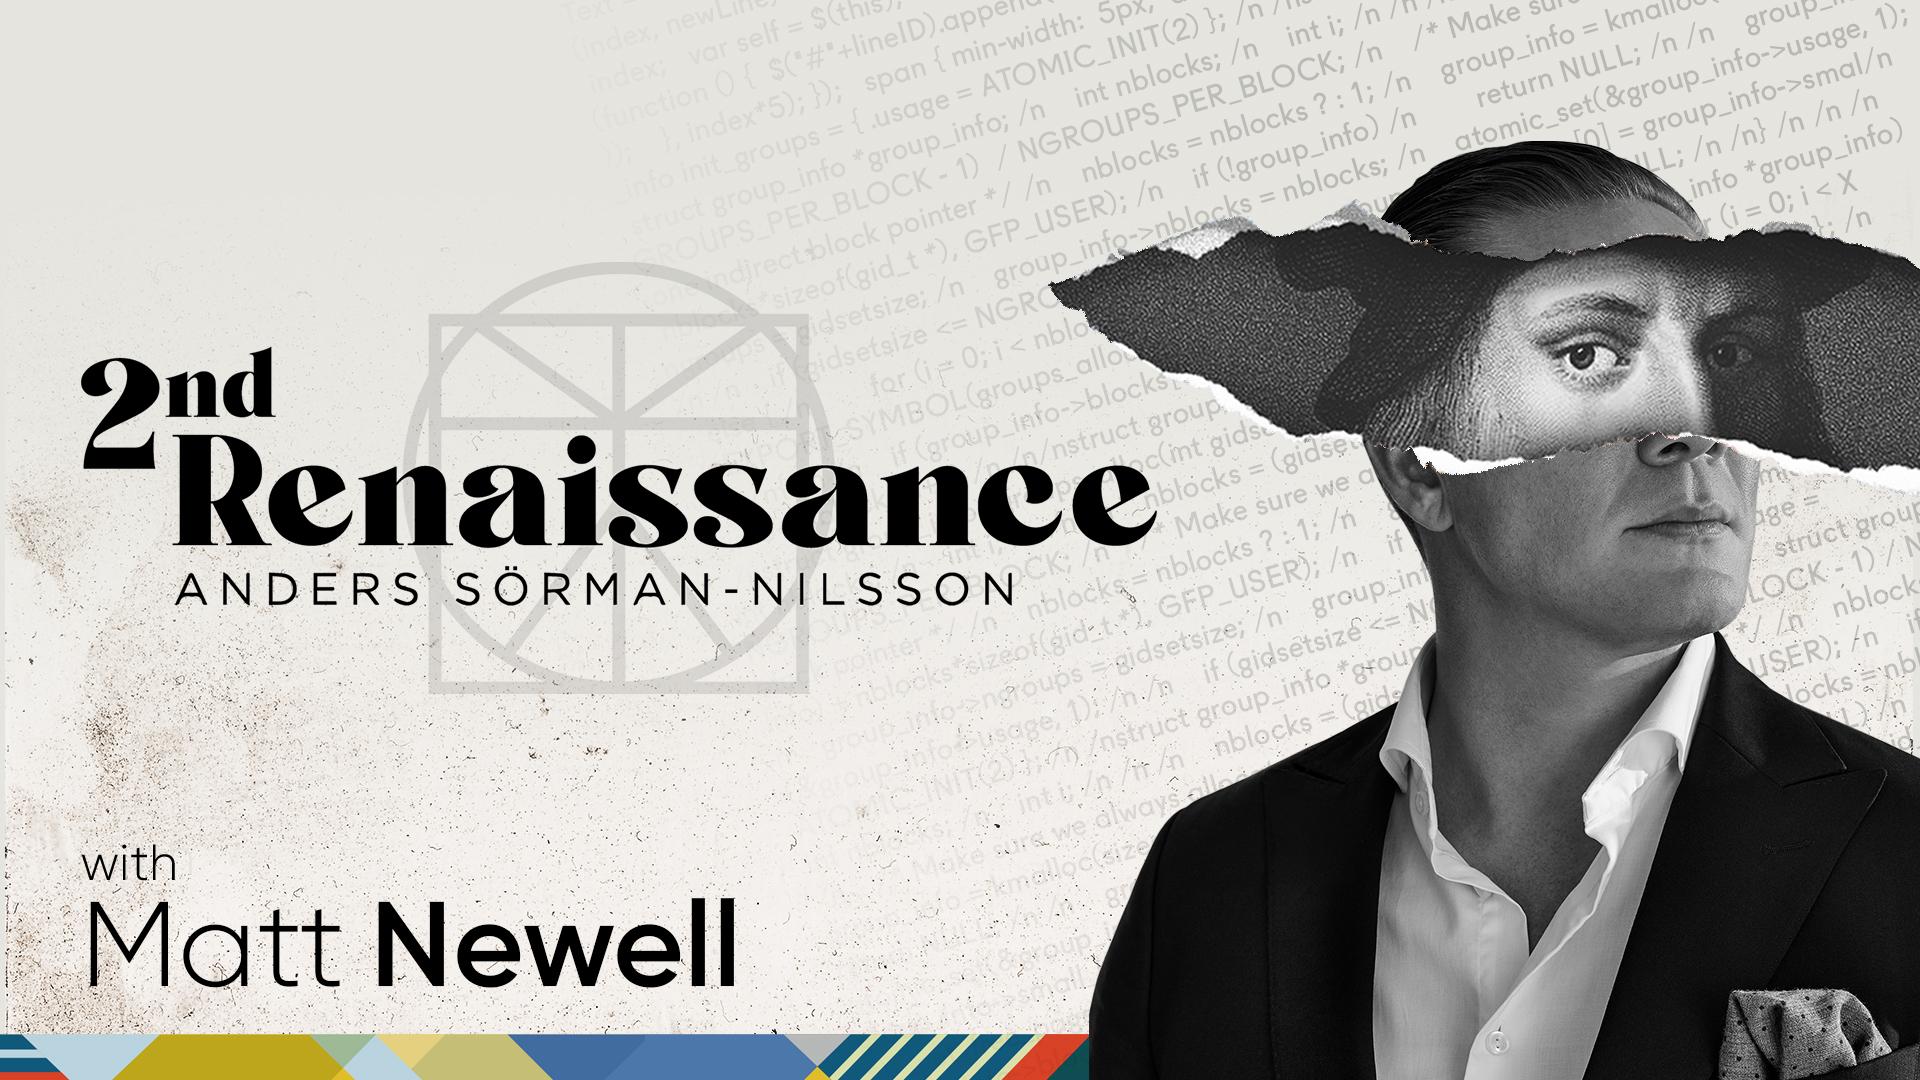 2nd Renaissance Futurist Anders Sorman-Nilsson